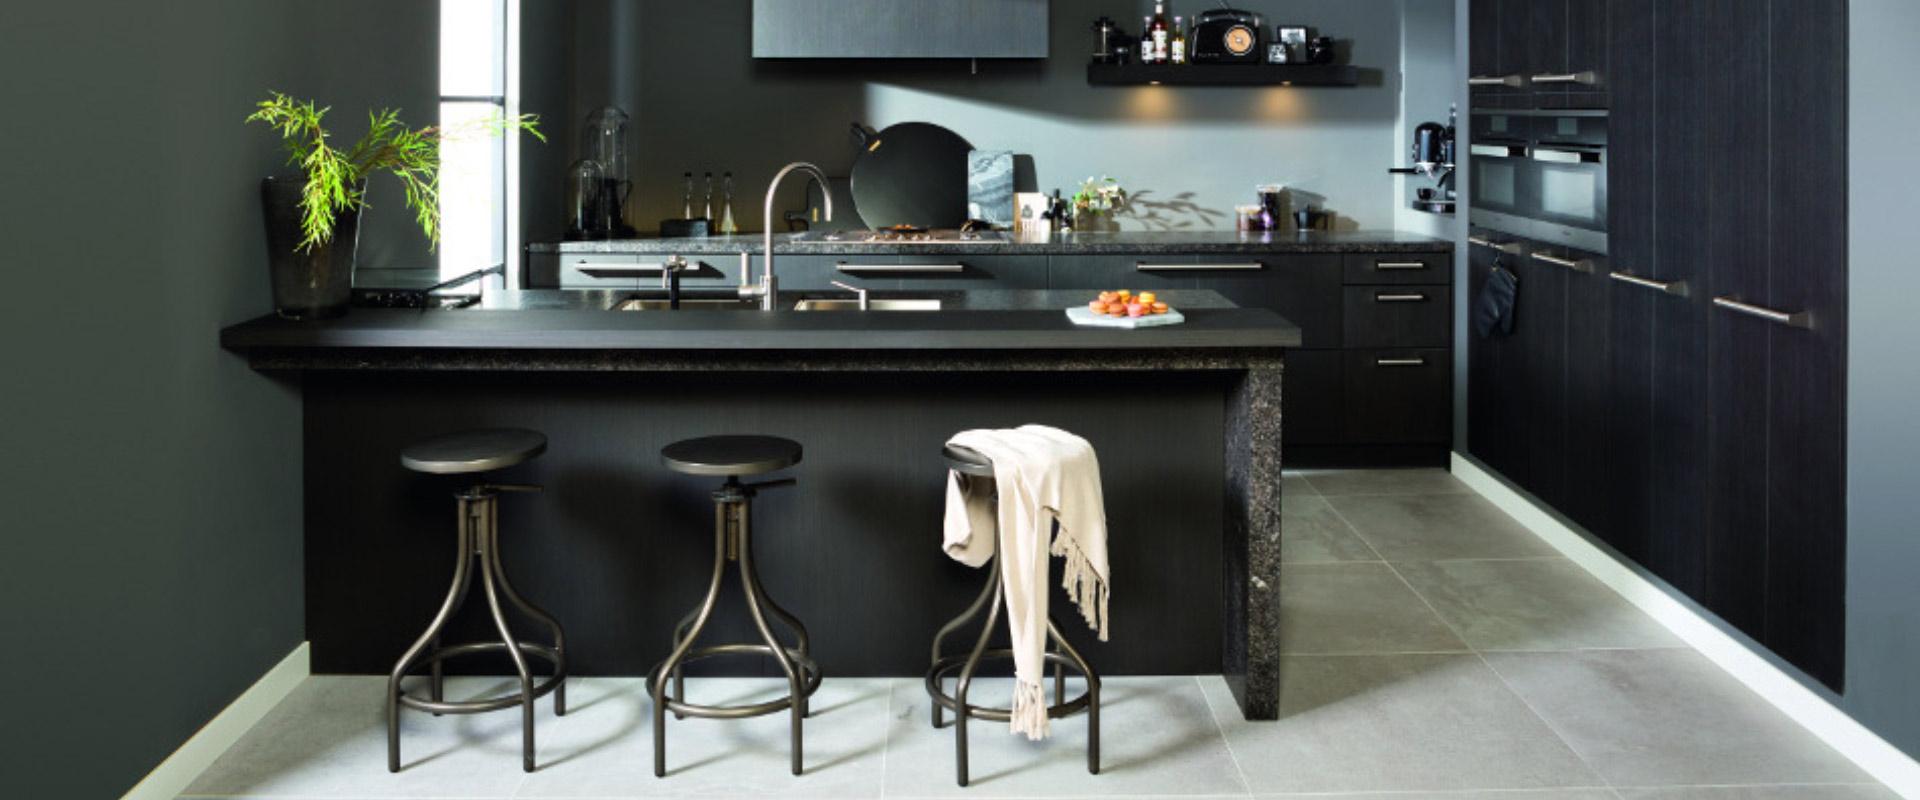 keuken bar